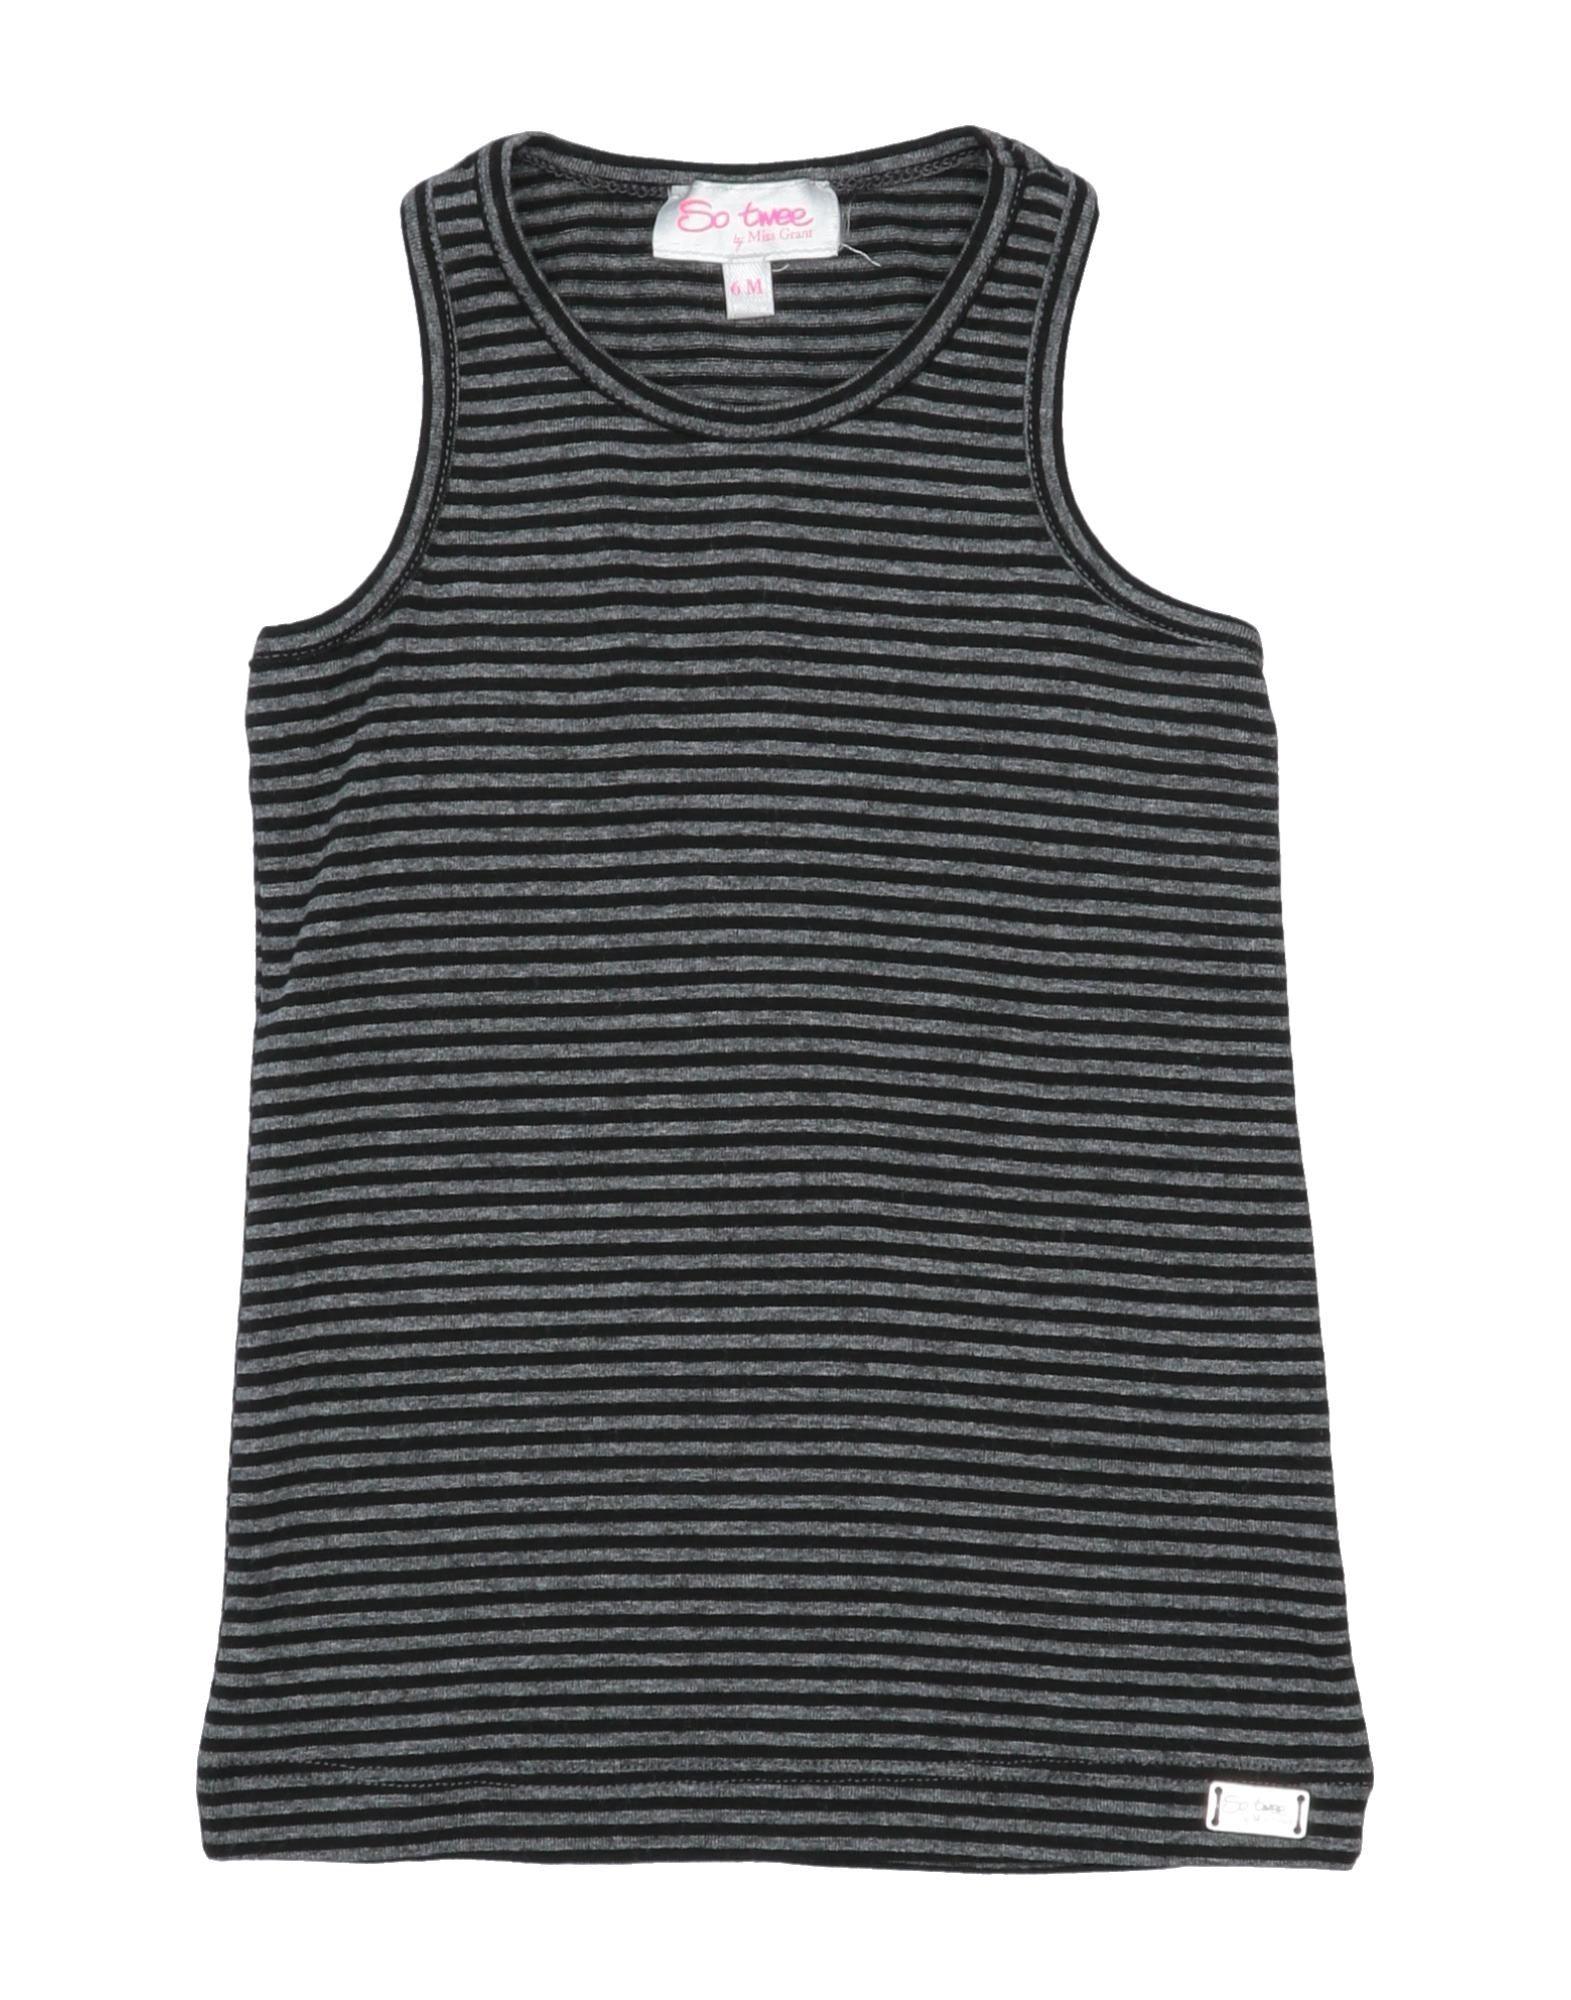 So Twee By Miss Grant Kids' T-shirts In Black